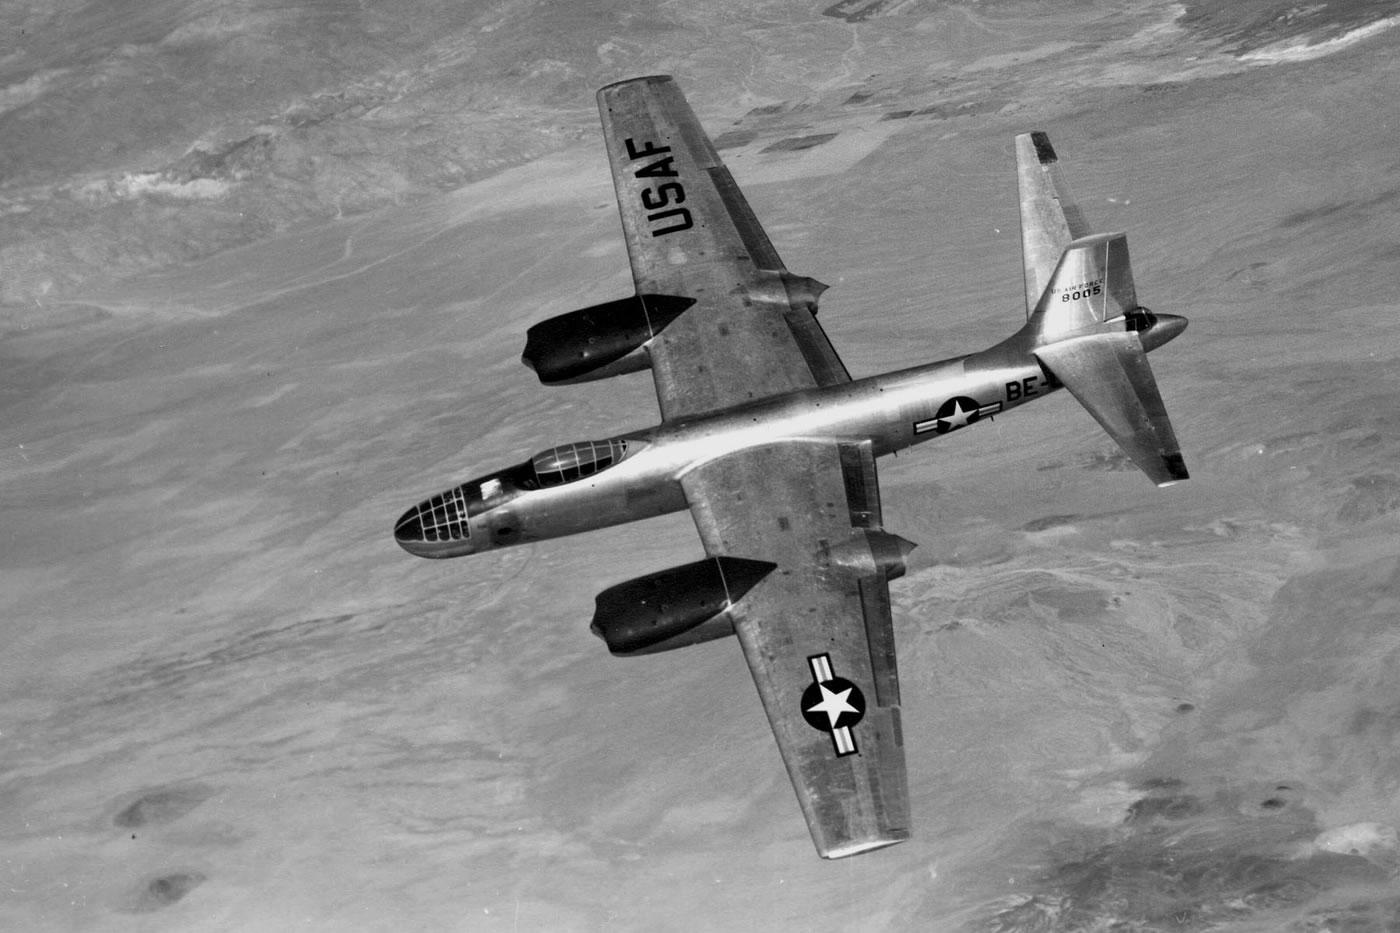 War thunder gameplay bombers baseball marin